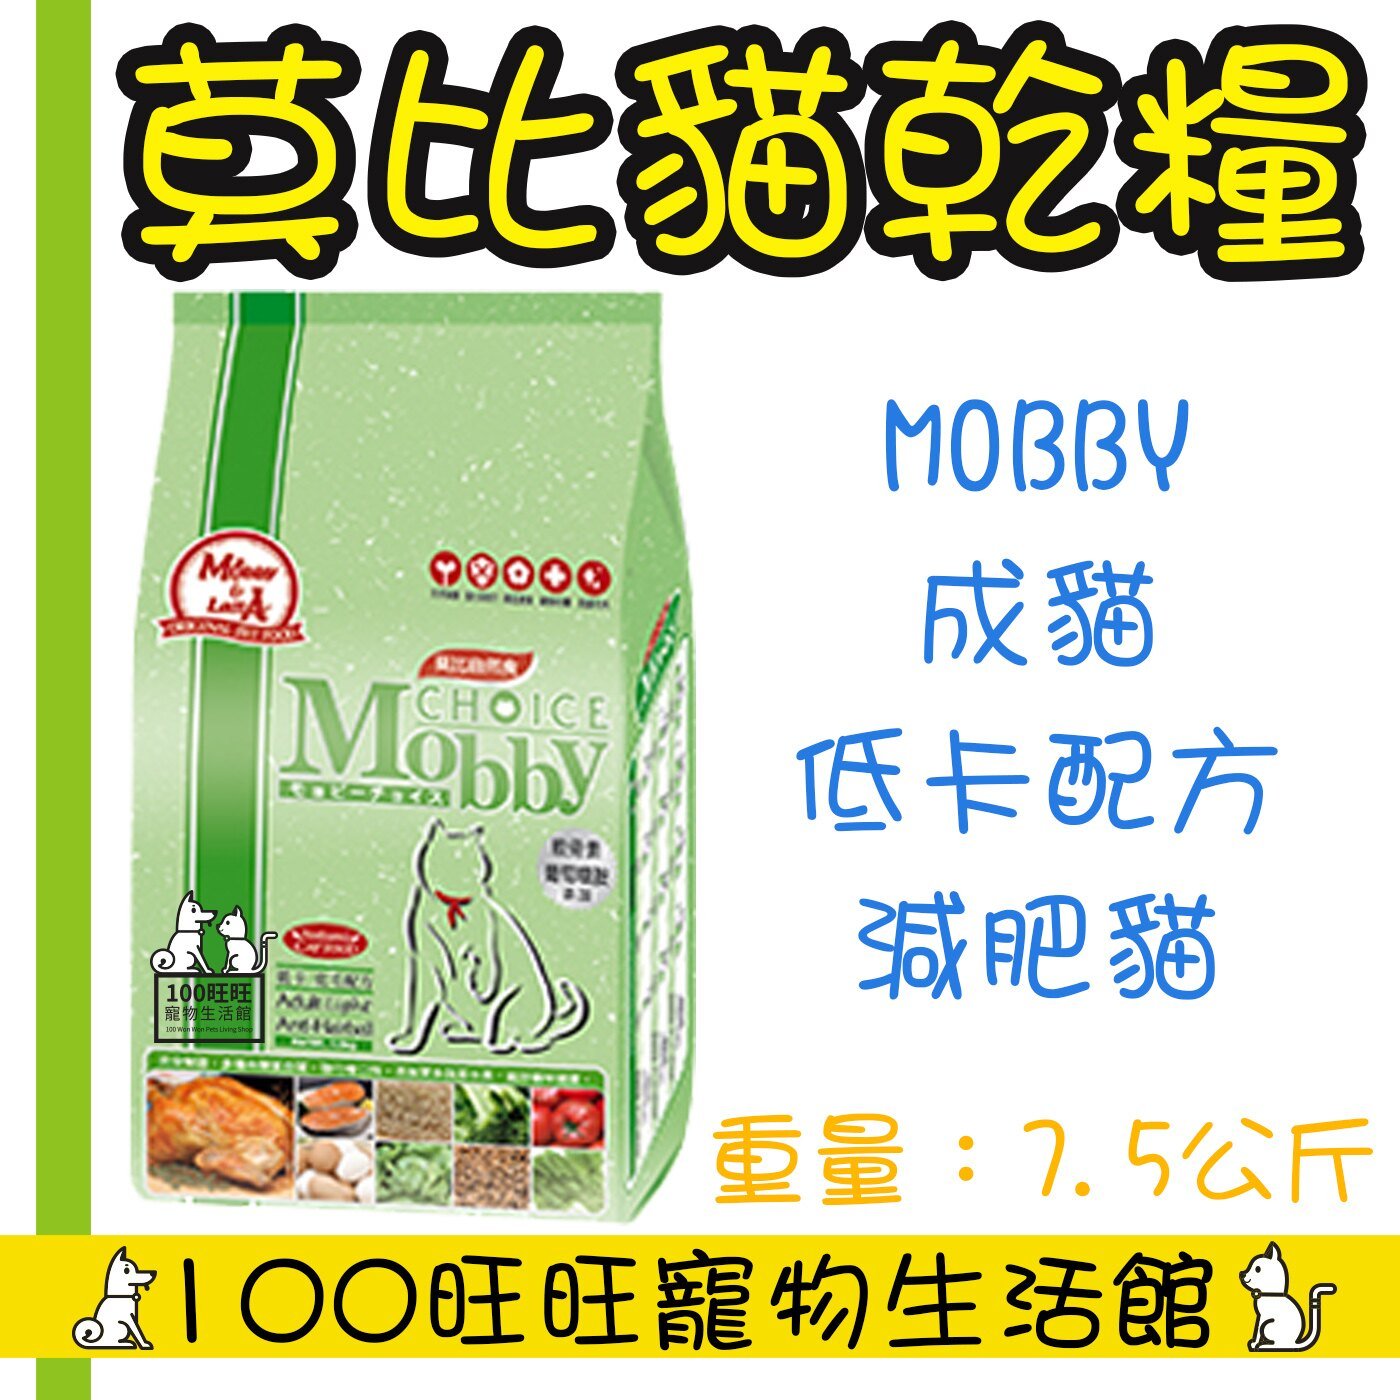 Mobby 莫比 雞肉米 低卡貓 抗毛球配方 7.5kg